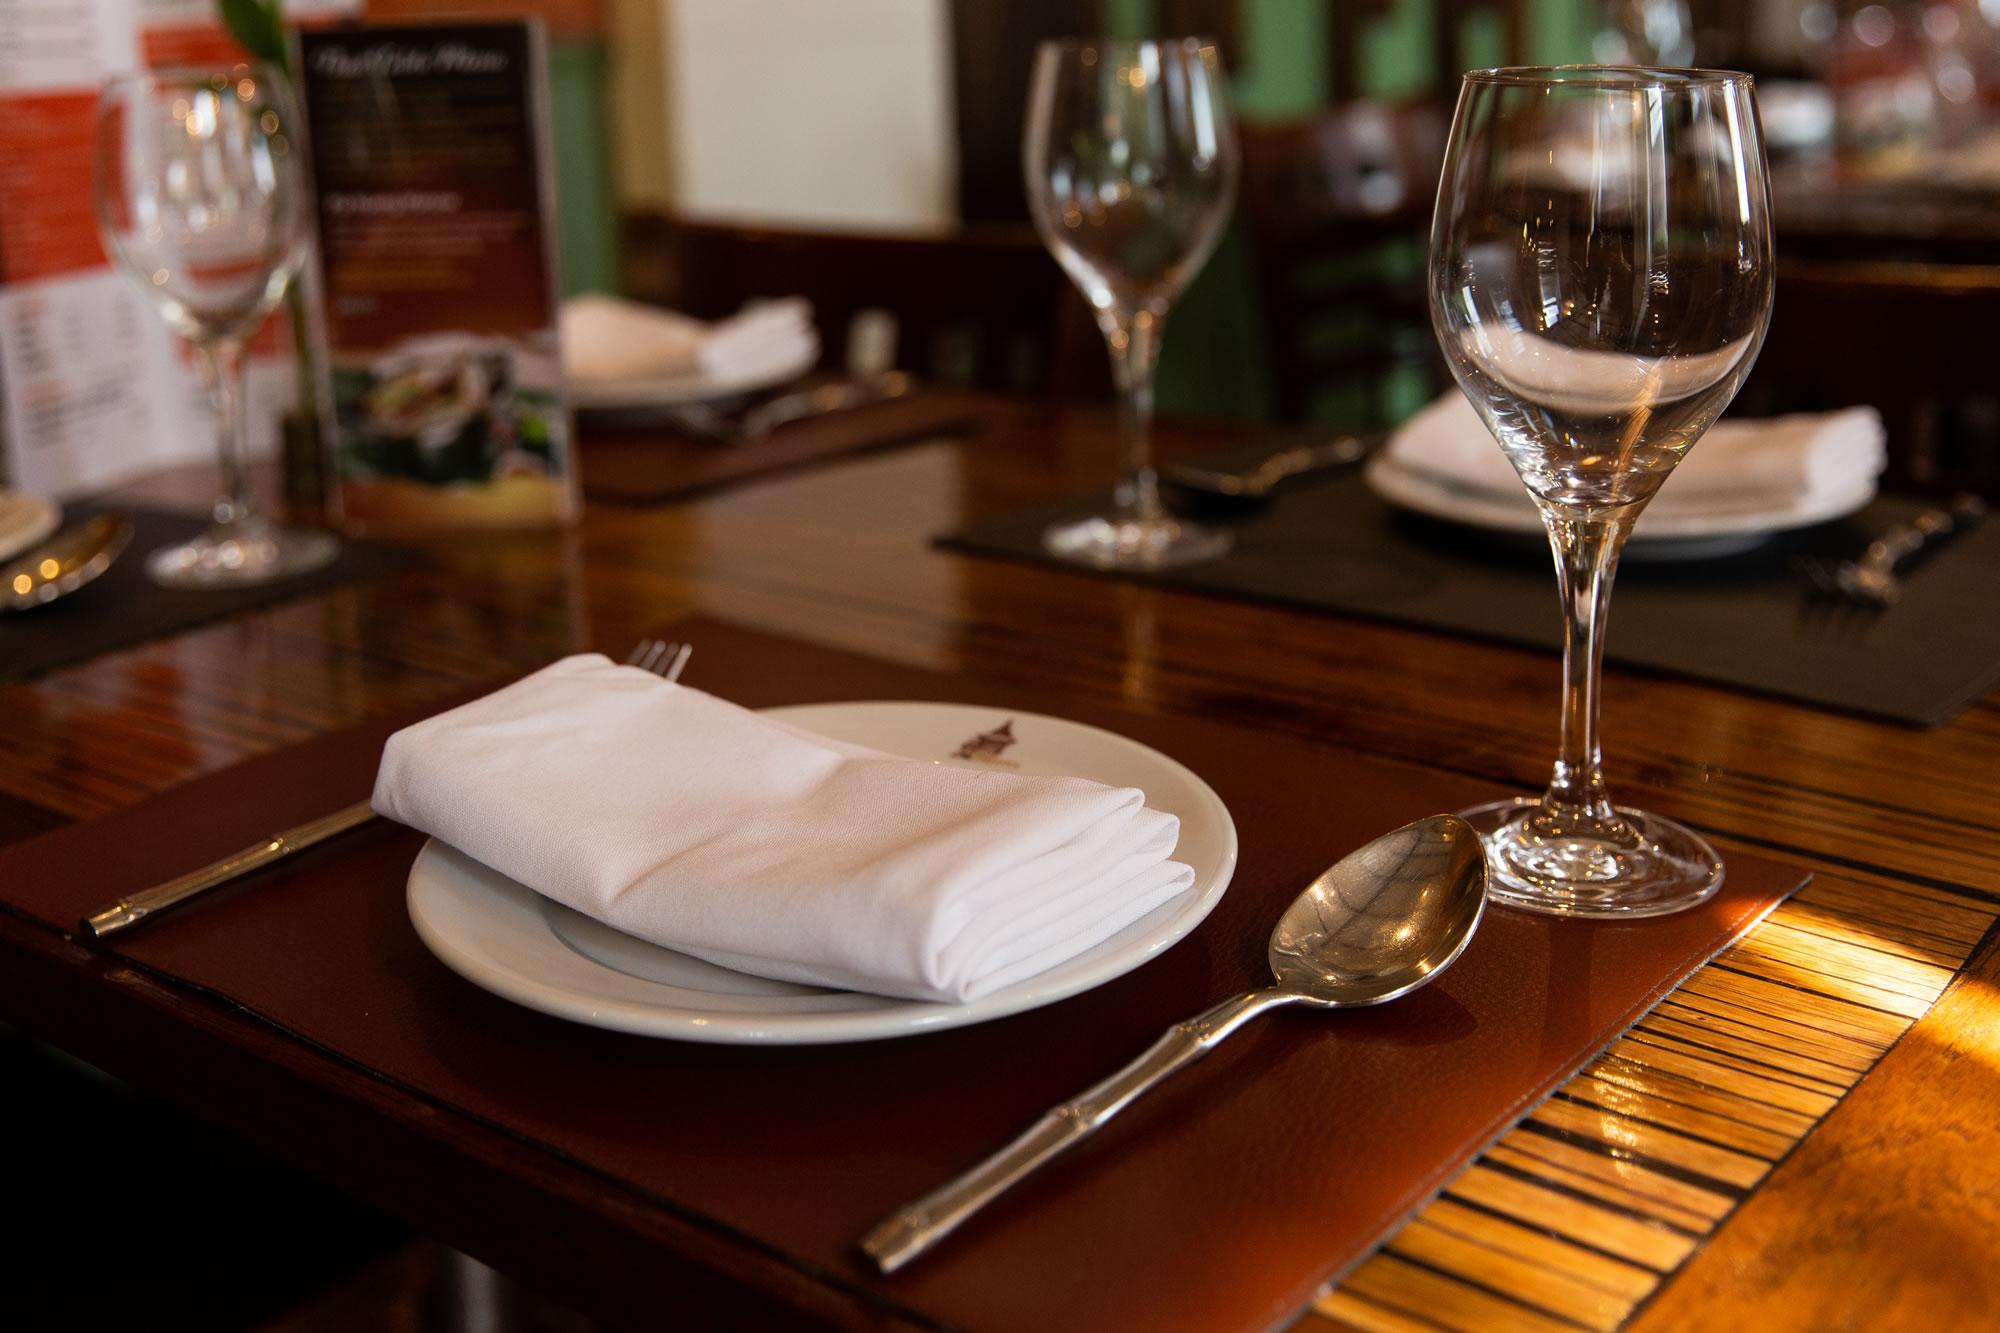 Baan_Thitiya_Thai_Restaurant_Bishops_Stortford-16.jpg